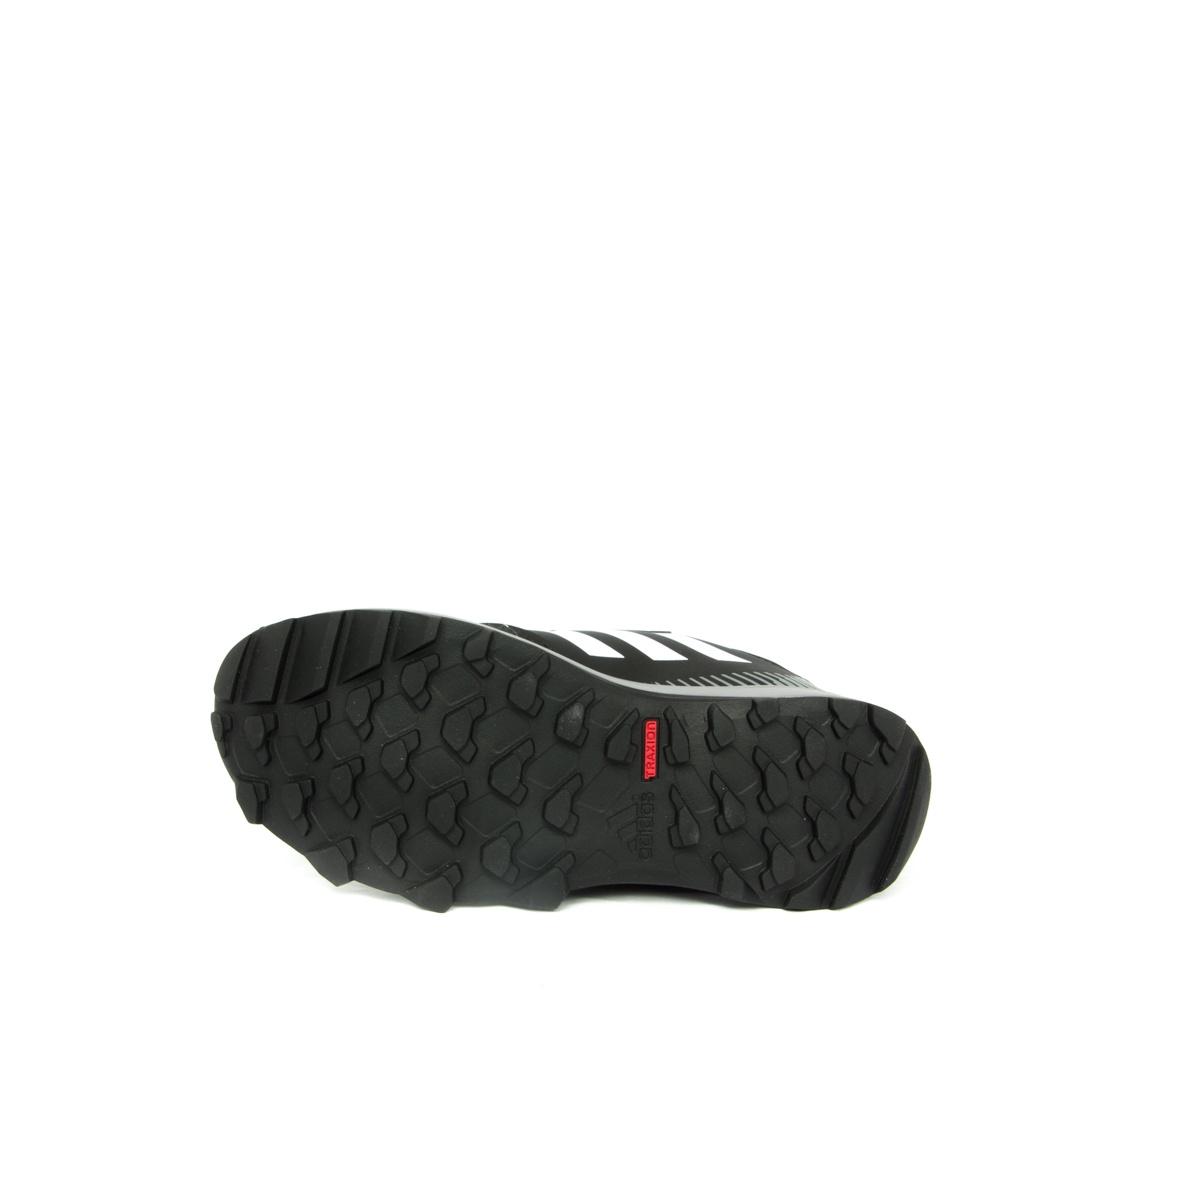 Azul Despedida Privilegio  Adidas Terrex Tracerocker CF G26532 Carbon/Cloud White/Black Kids -  Frontrunner Queenstown